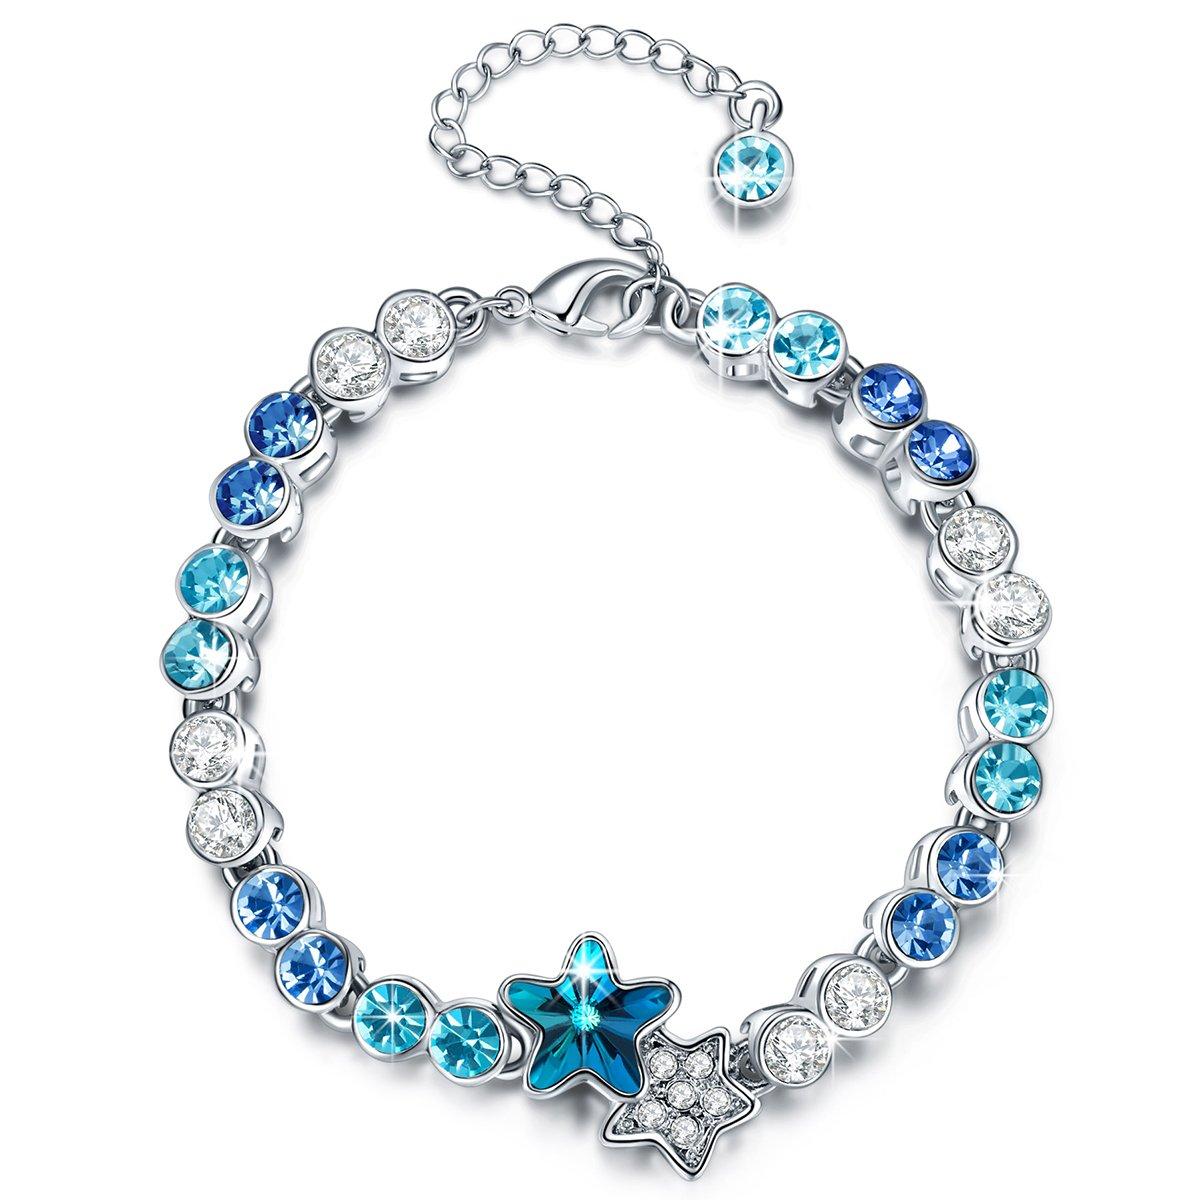 LADY COLOUR Blue Star Link Bracelet for Women 7